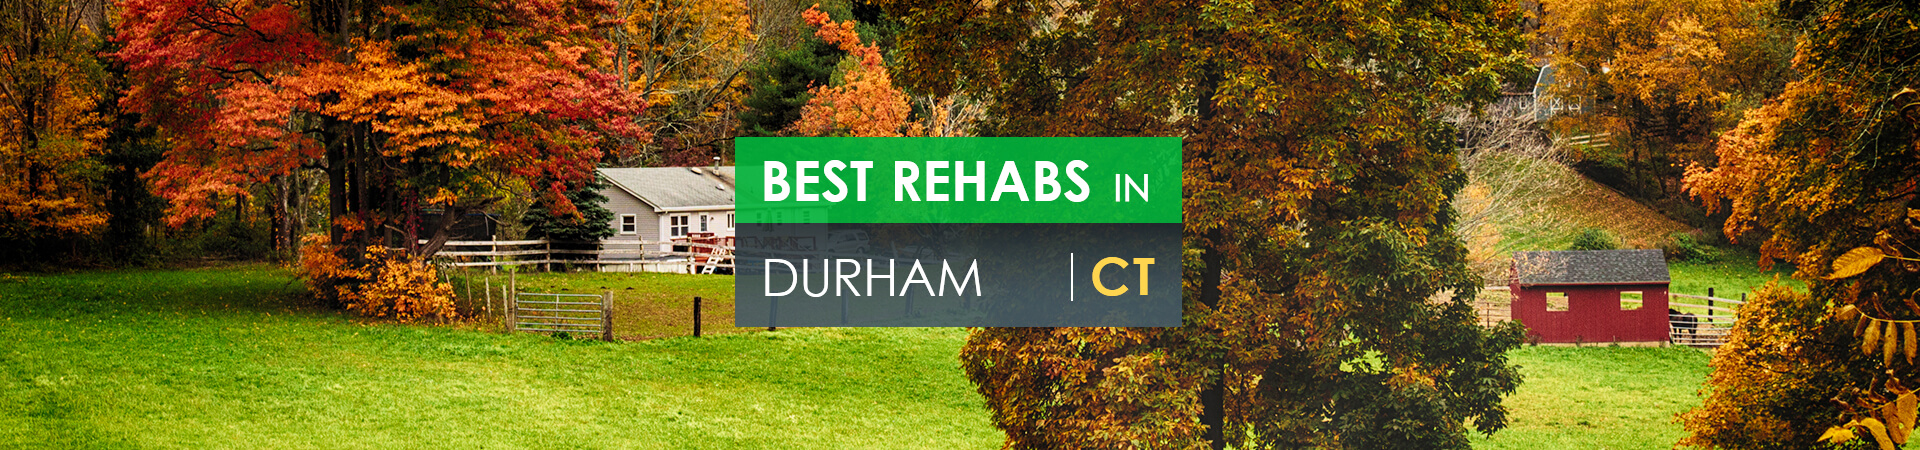 Best rehabs in Durham, CT